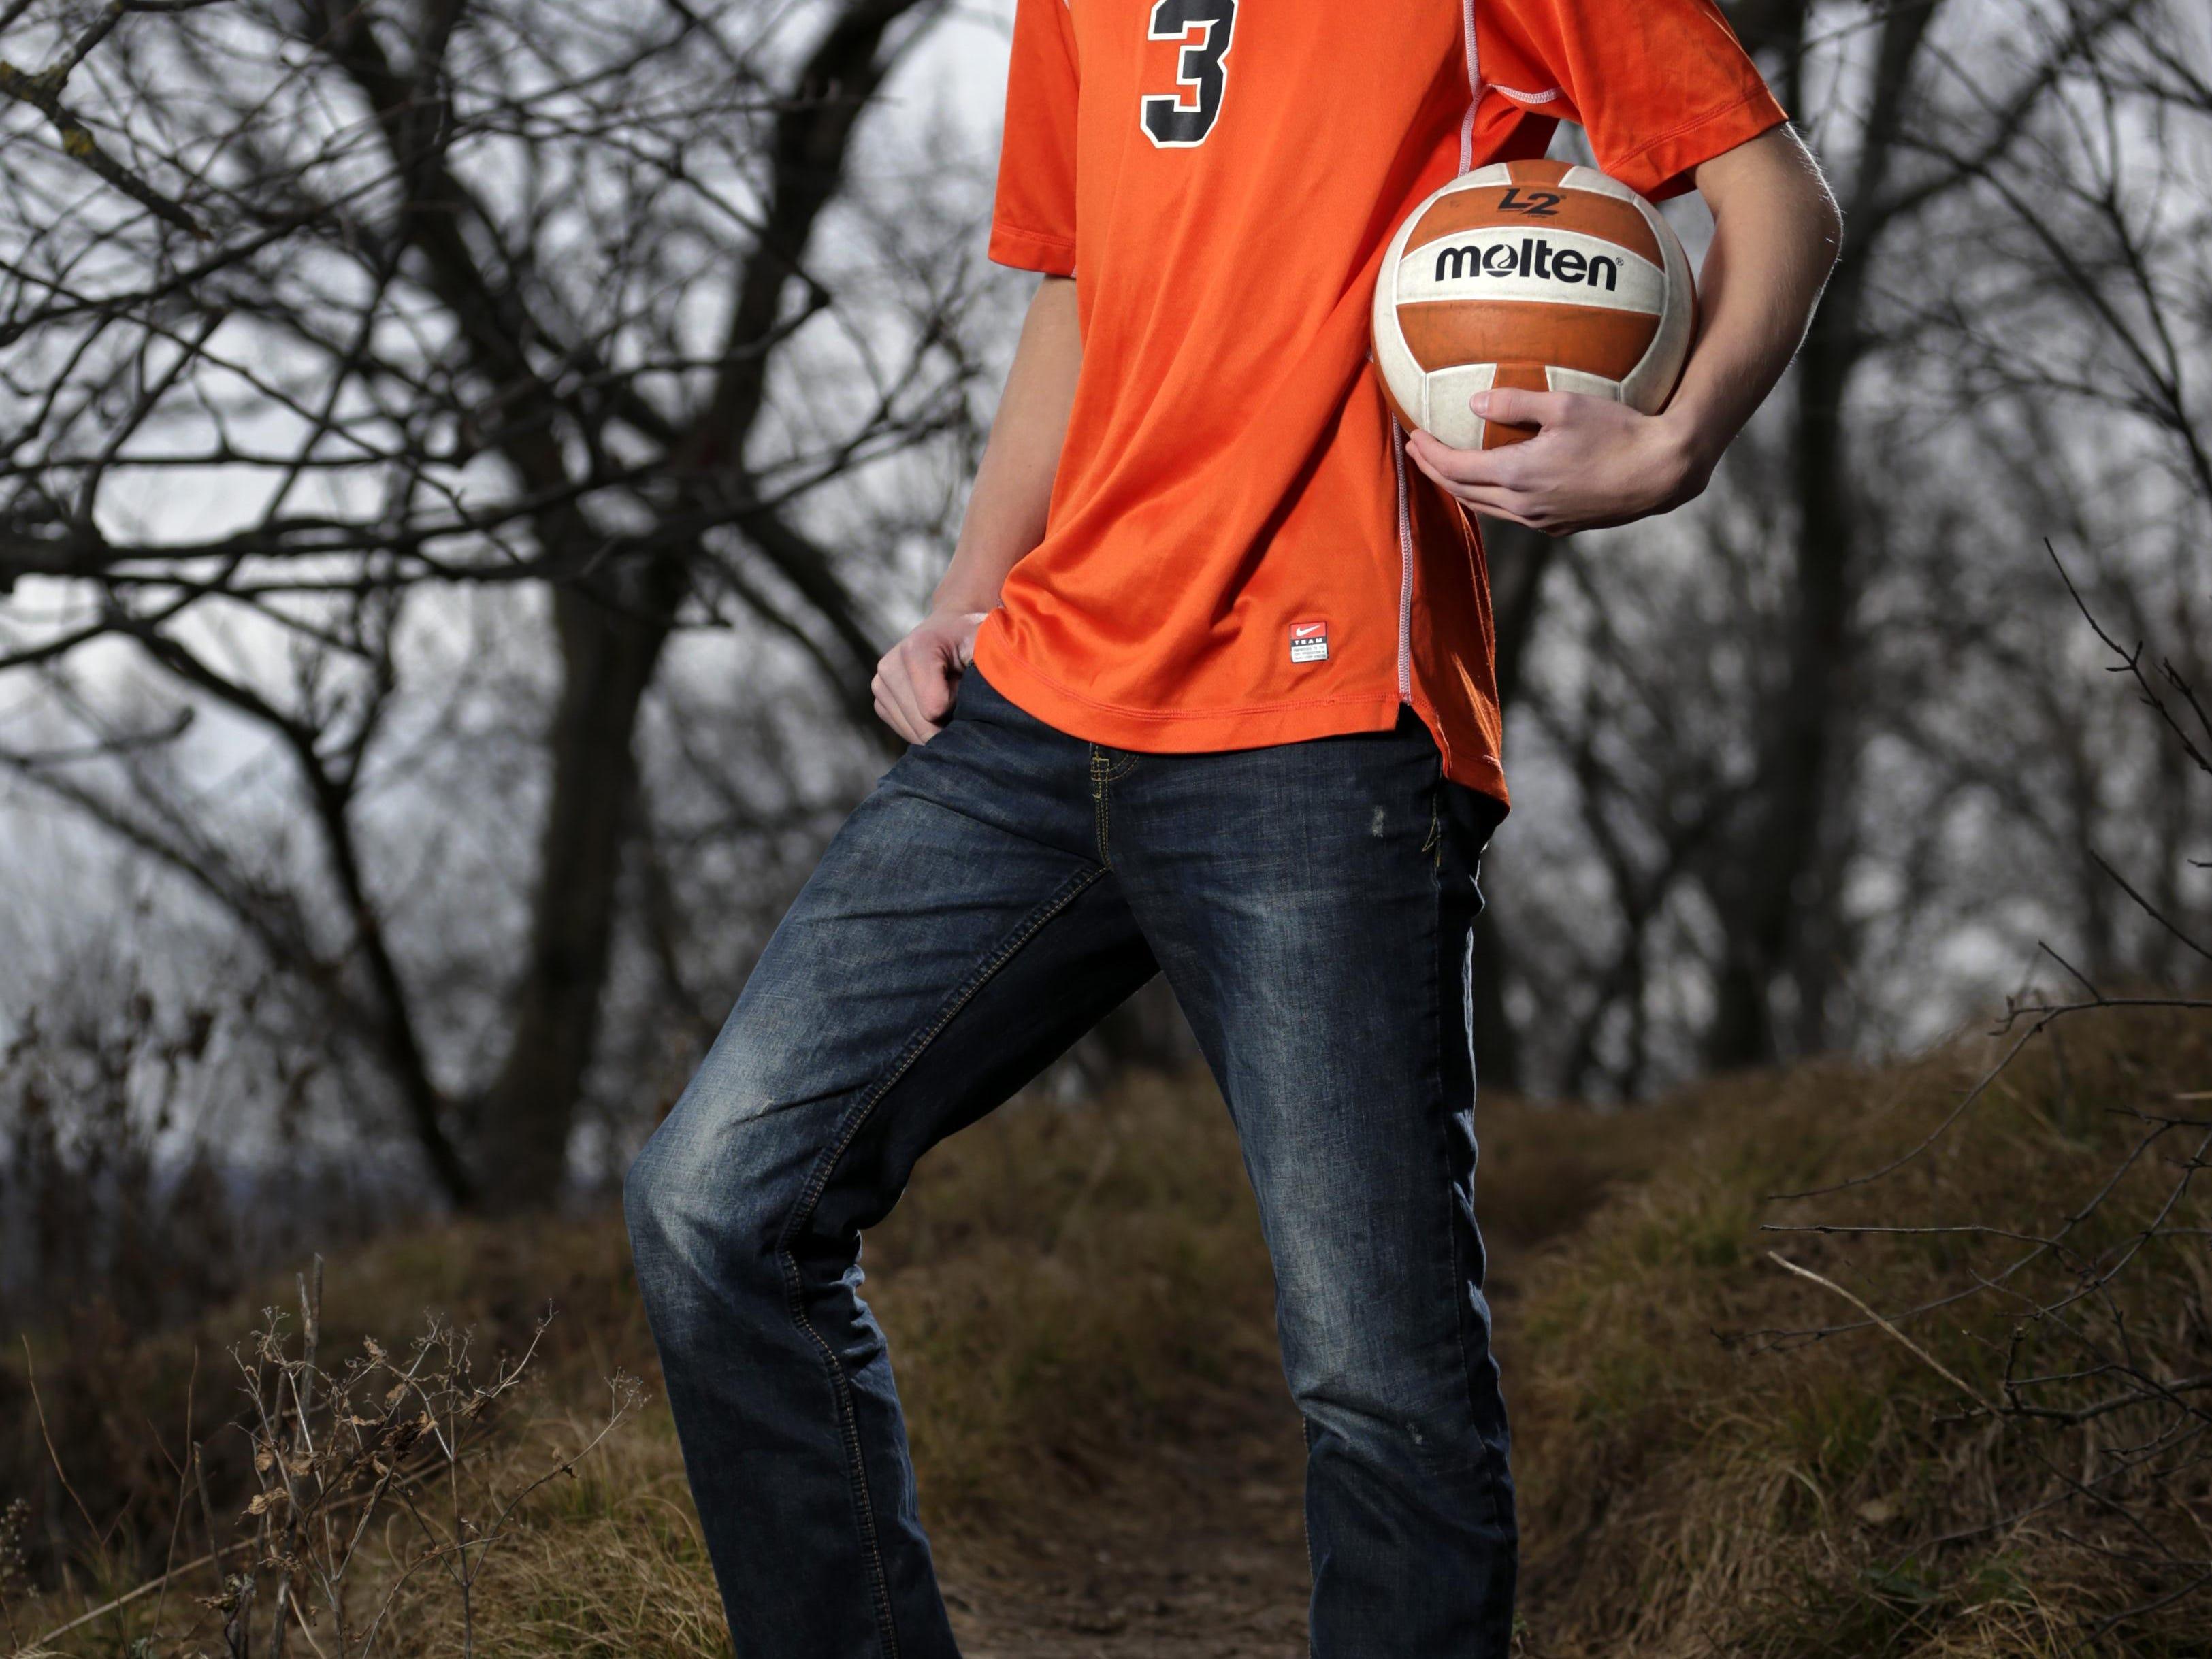 Kaukauna's Dalton Erdman is Post-Crescent Media's athlete of the year in boys' volleyball.